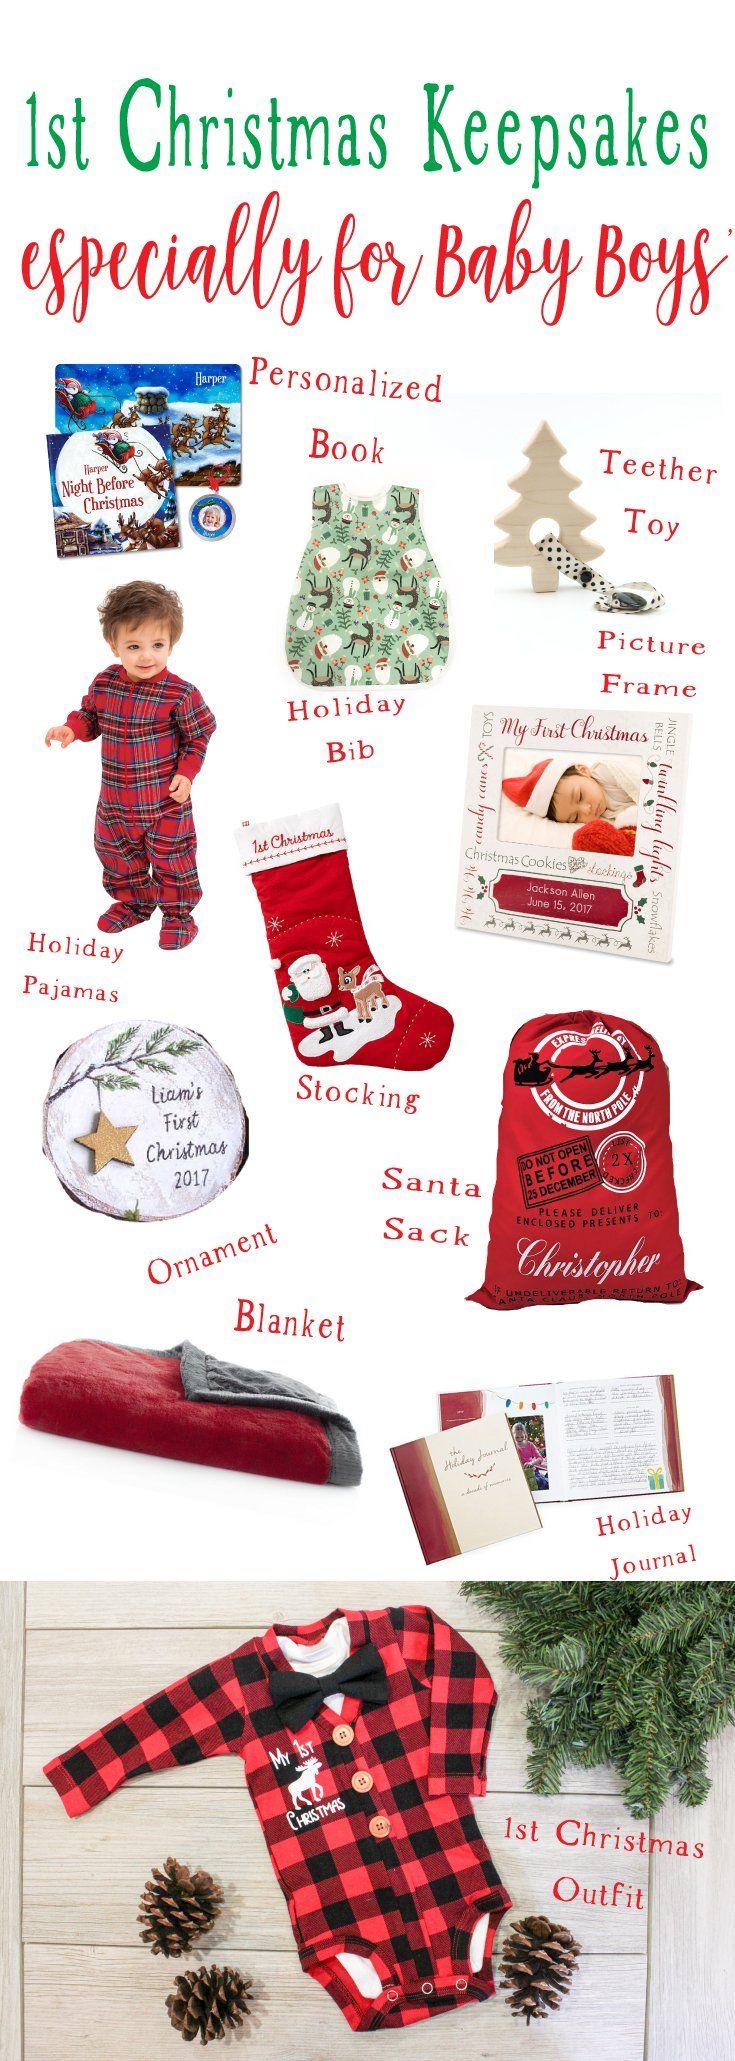 baby boy 1st christmas keepsake ideas